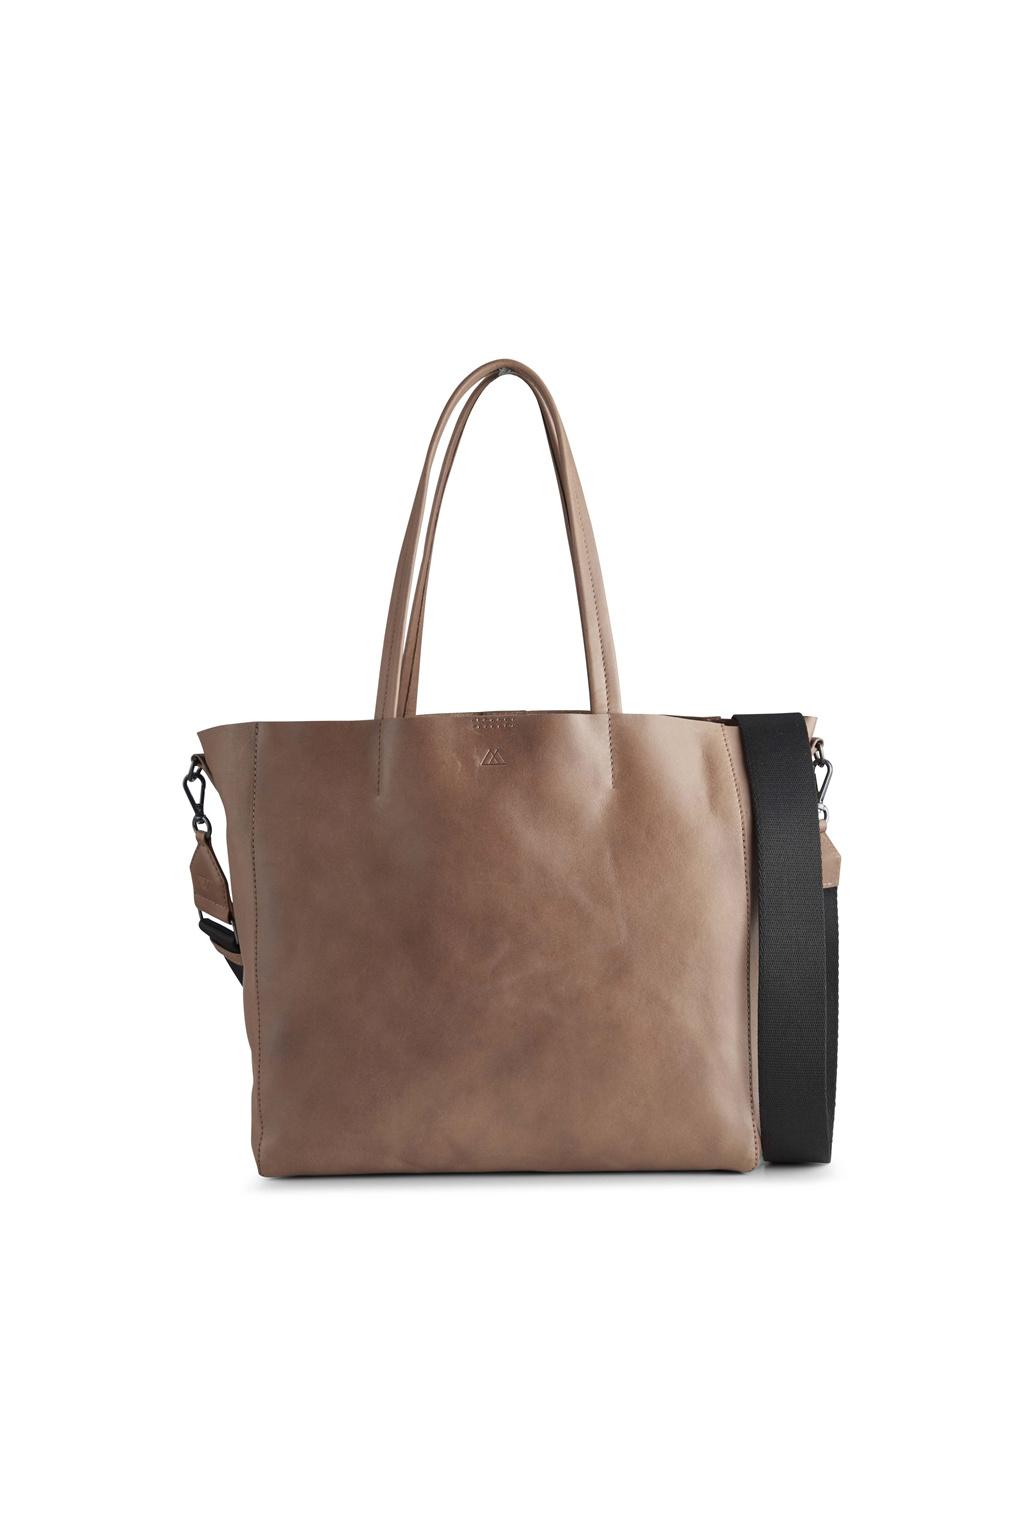 Reese Shopper Bag - Antique Caramel w/ Black-1